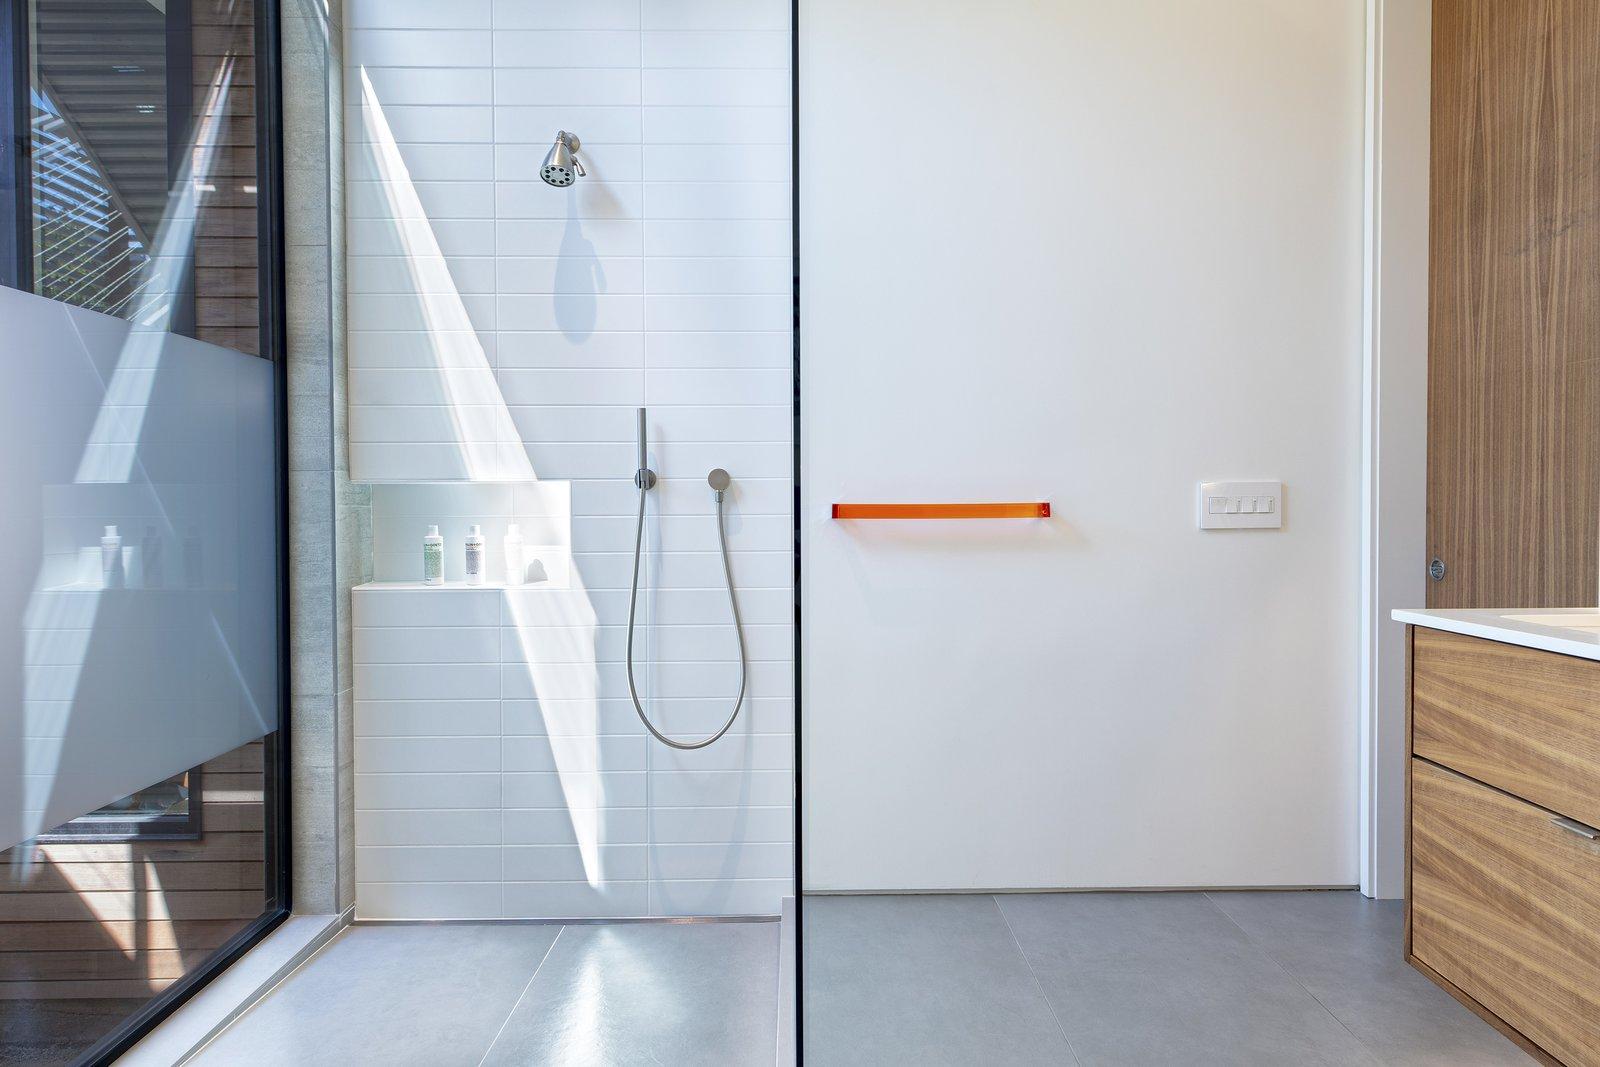 Bath Room Main Bath  Precita Park Residence by Studio Sarah Willmer, Architecture